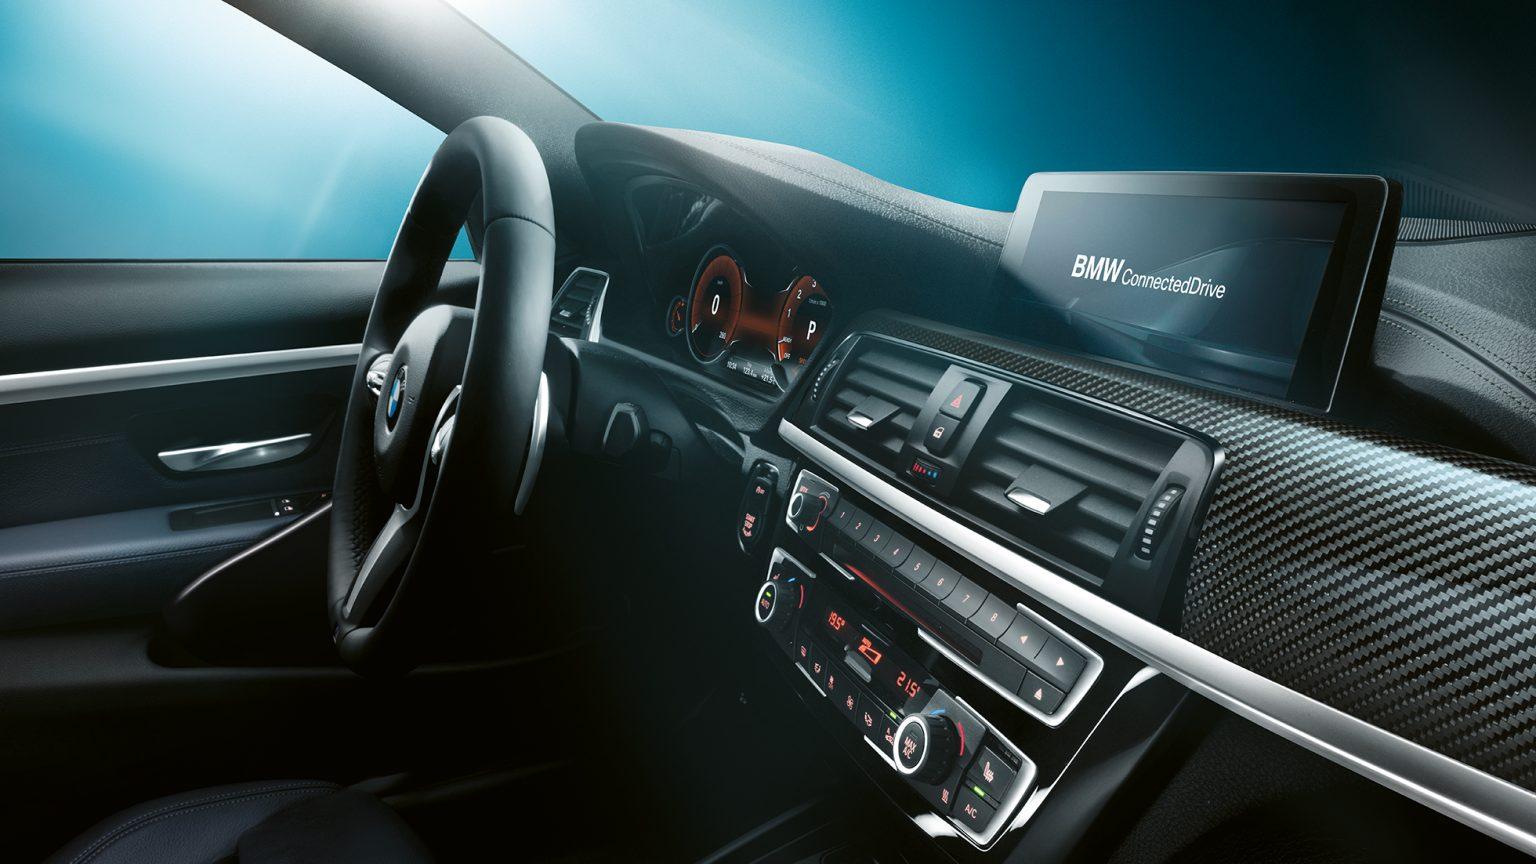 bmw-4-series-coupe-inspire-mg-exterior-interior-design-desktop-05